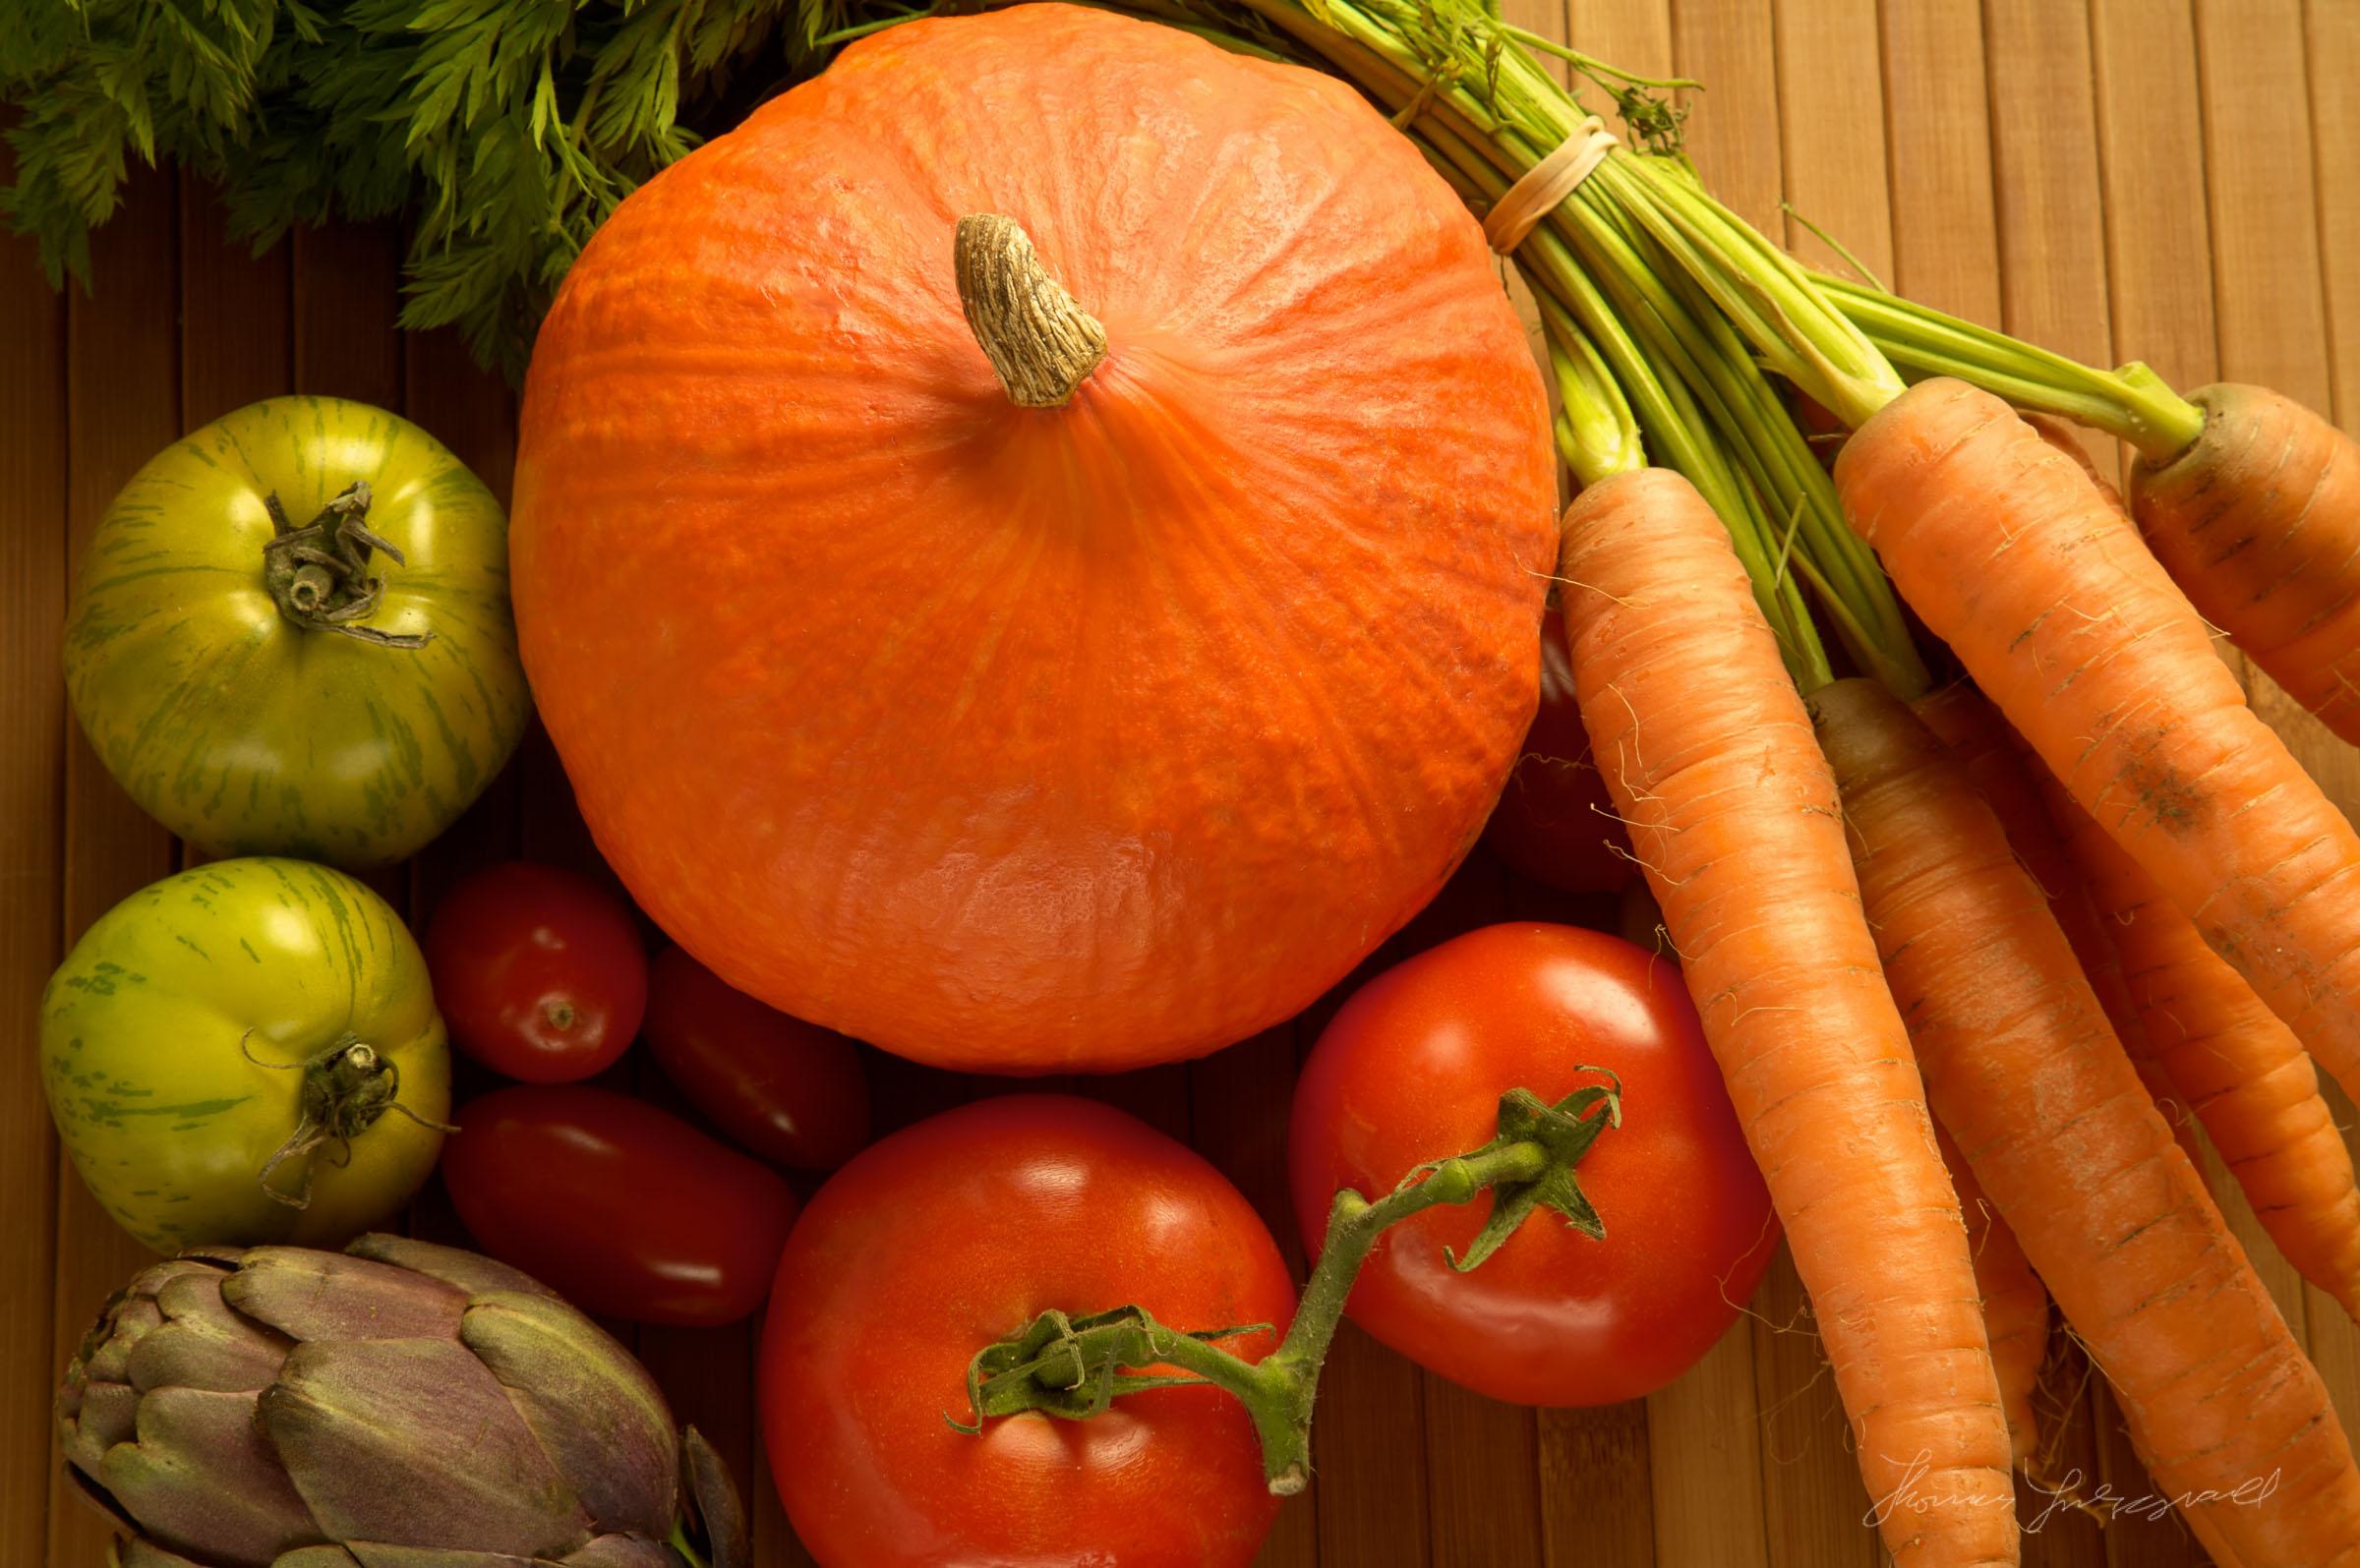 Farmers Market Vegetables On Wood Background Closer Shot.jpg